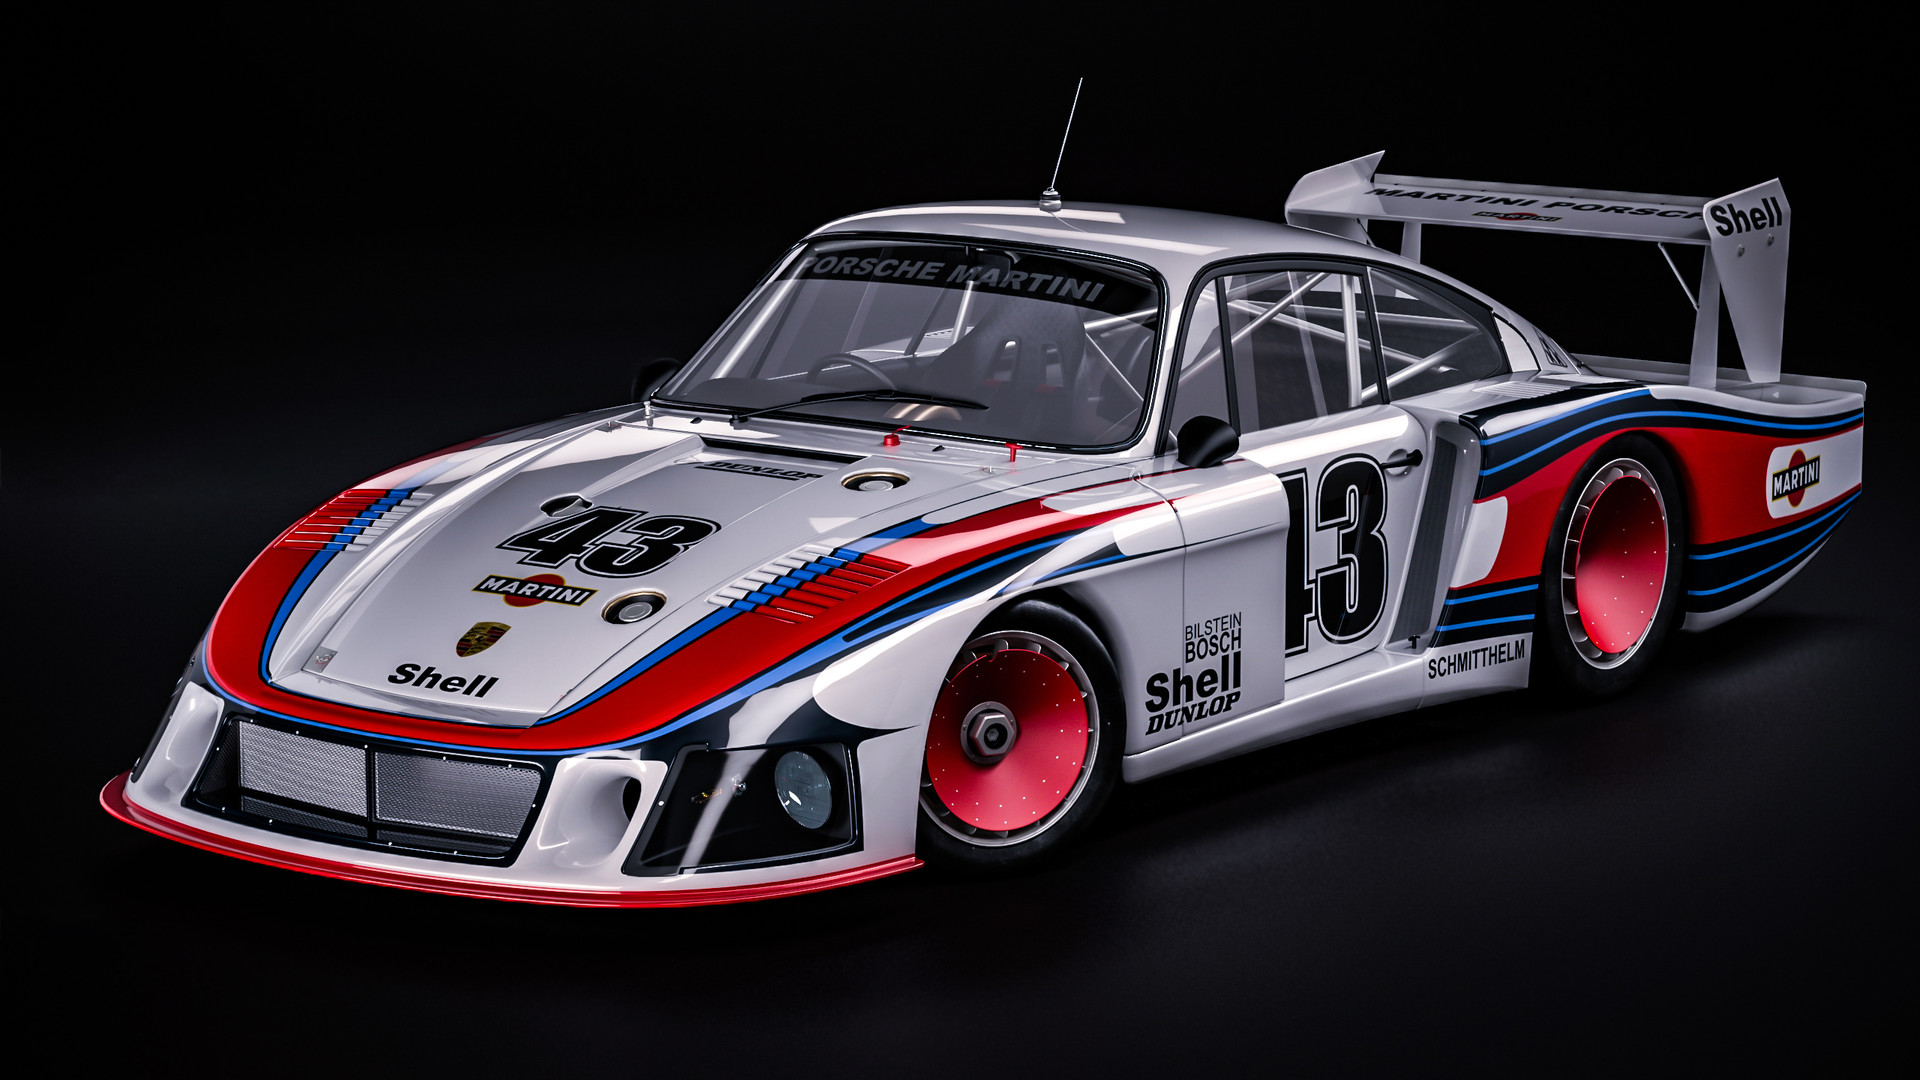 General 1920x1080 Porsche German cars car vehicle sports car digital art Porsche 935 Moby Dick race cars Martini